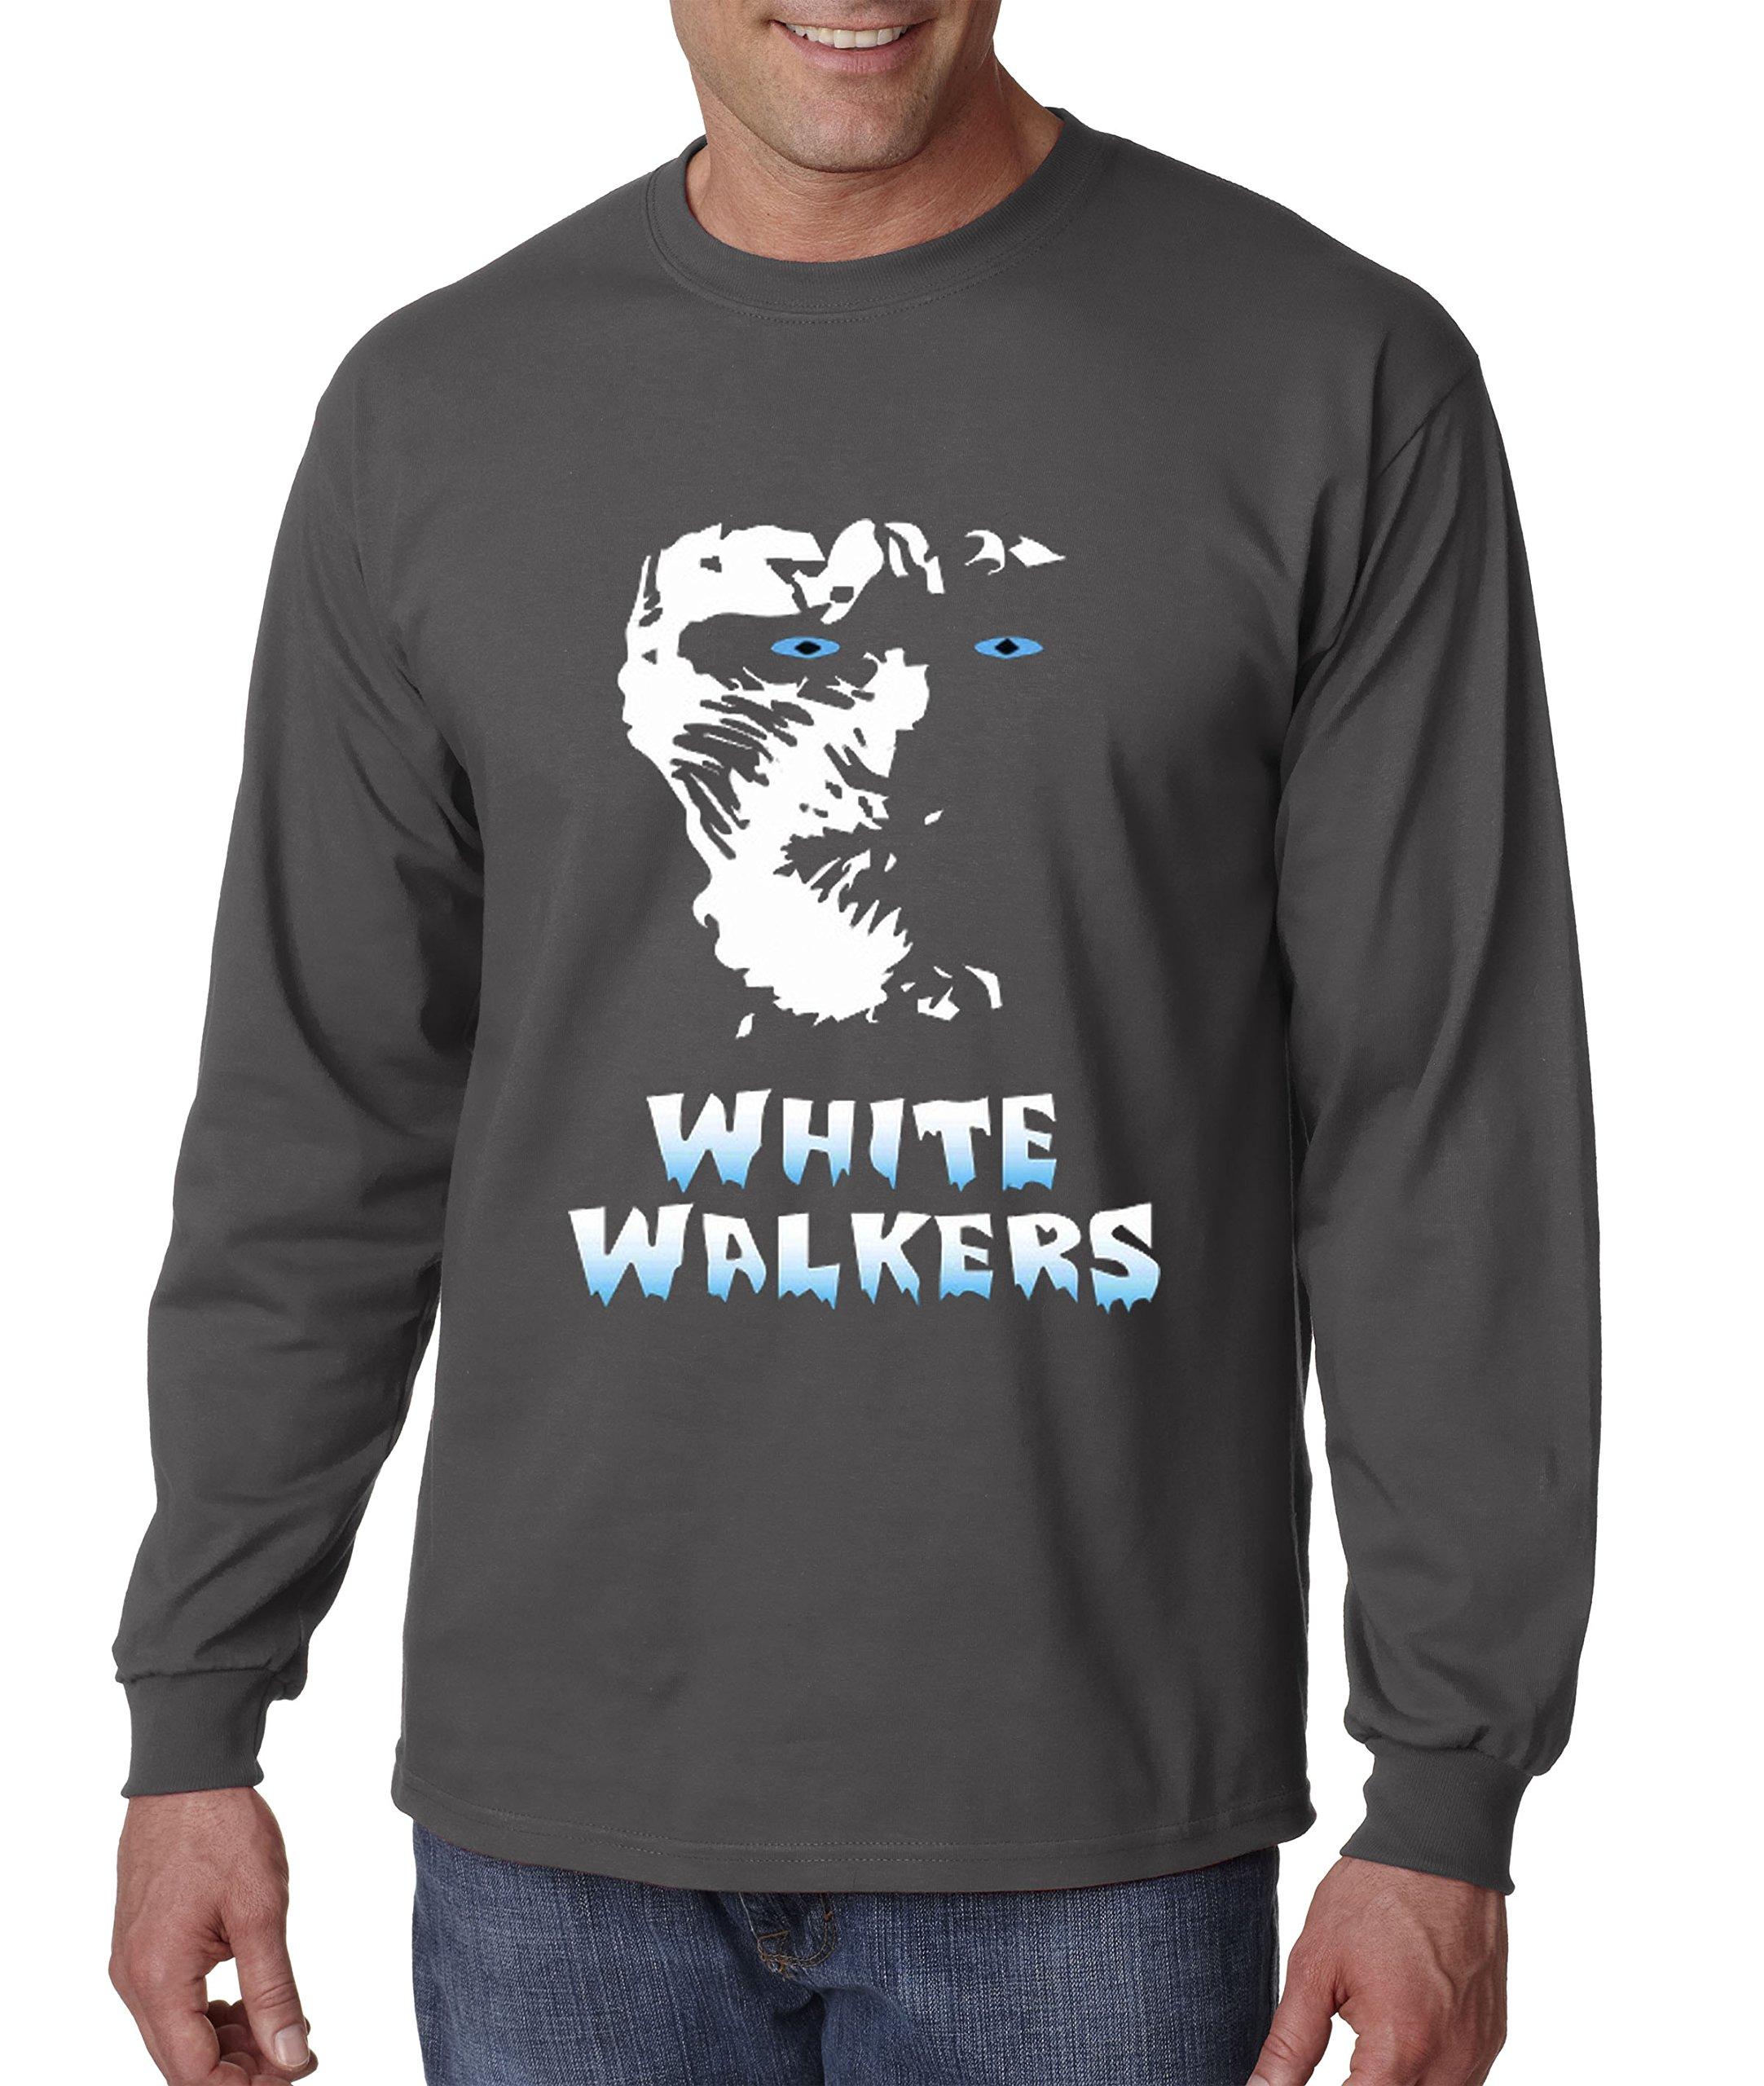 493 Unisex T Shirt Walkers 1175